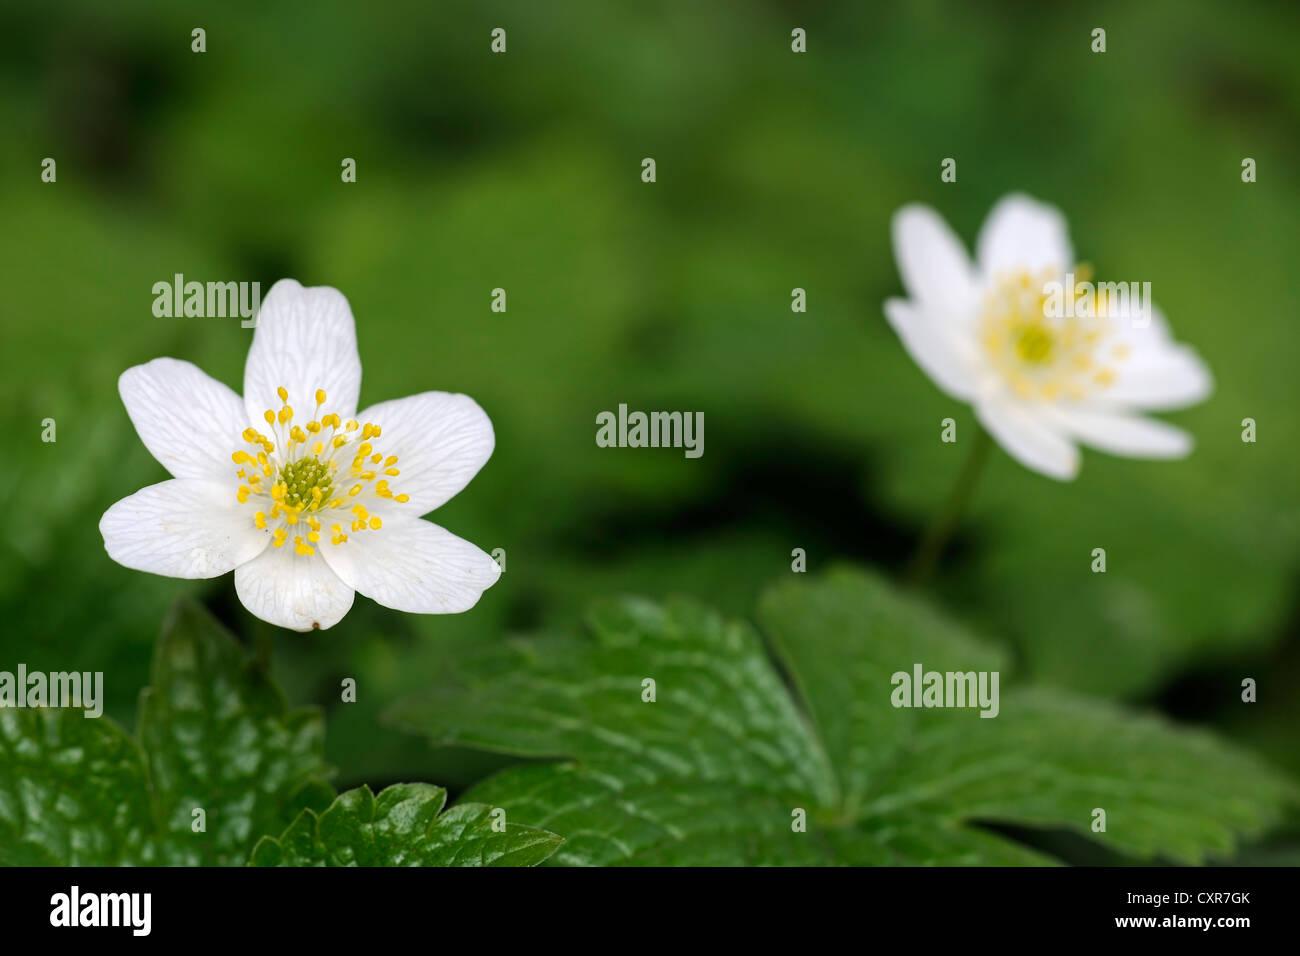 Legno Anemone, Thimbleweed o odore Fox (Anemone nemorosa ,), Berlino, Germania, Europa Immagini Stock